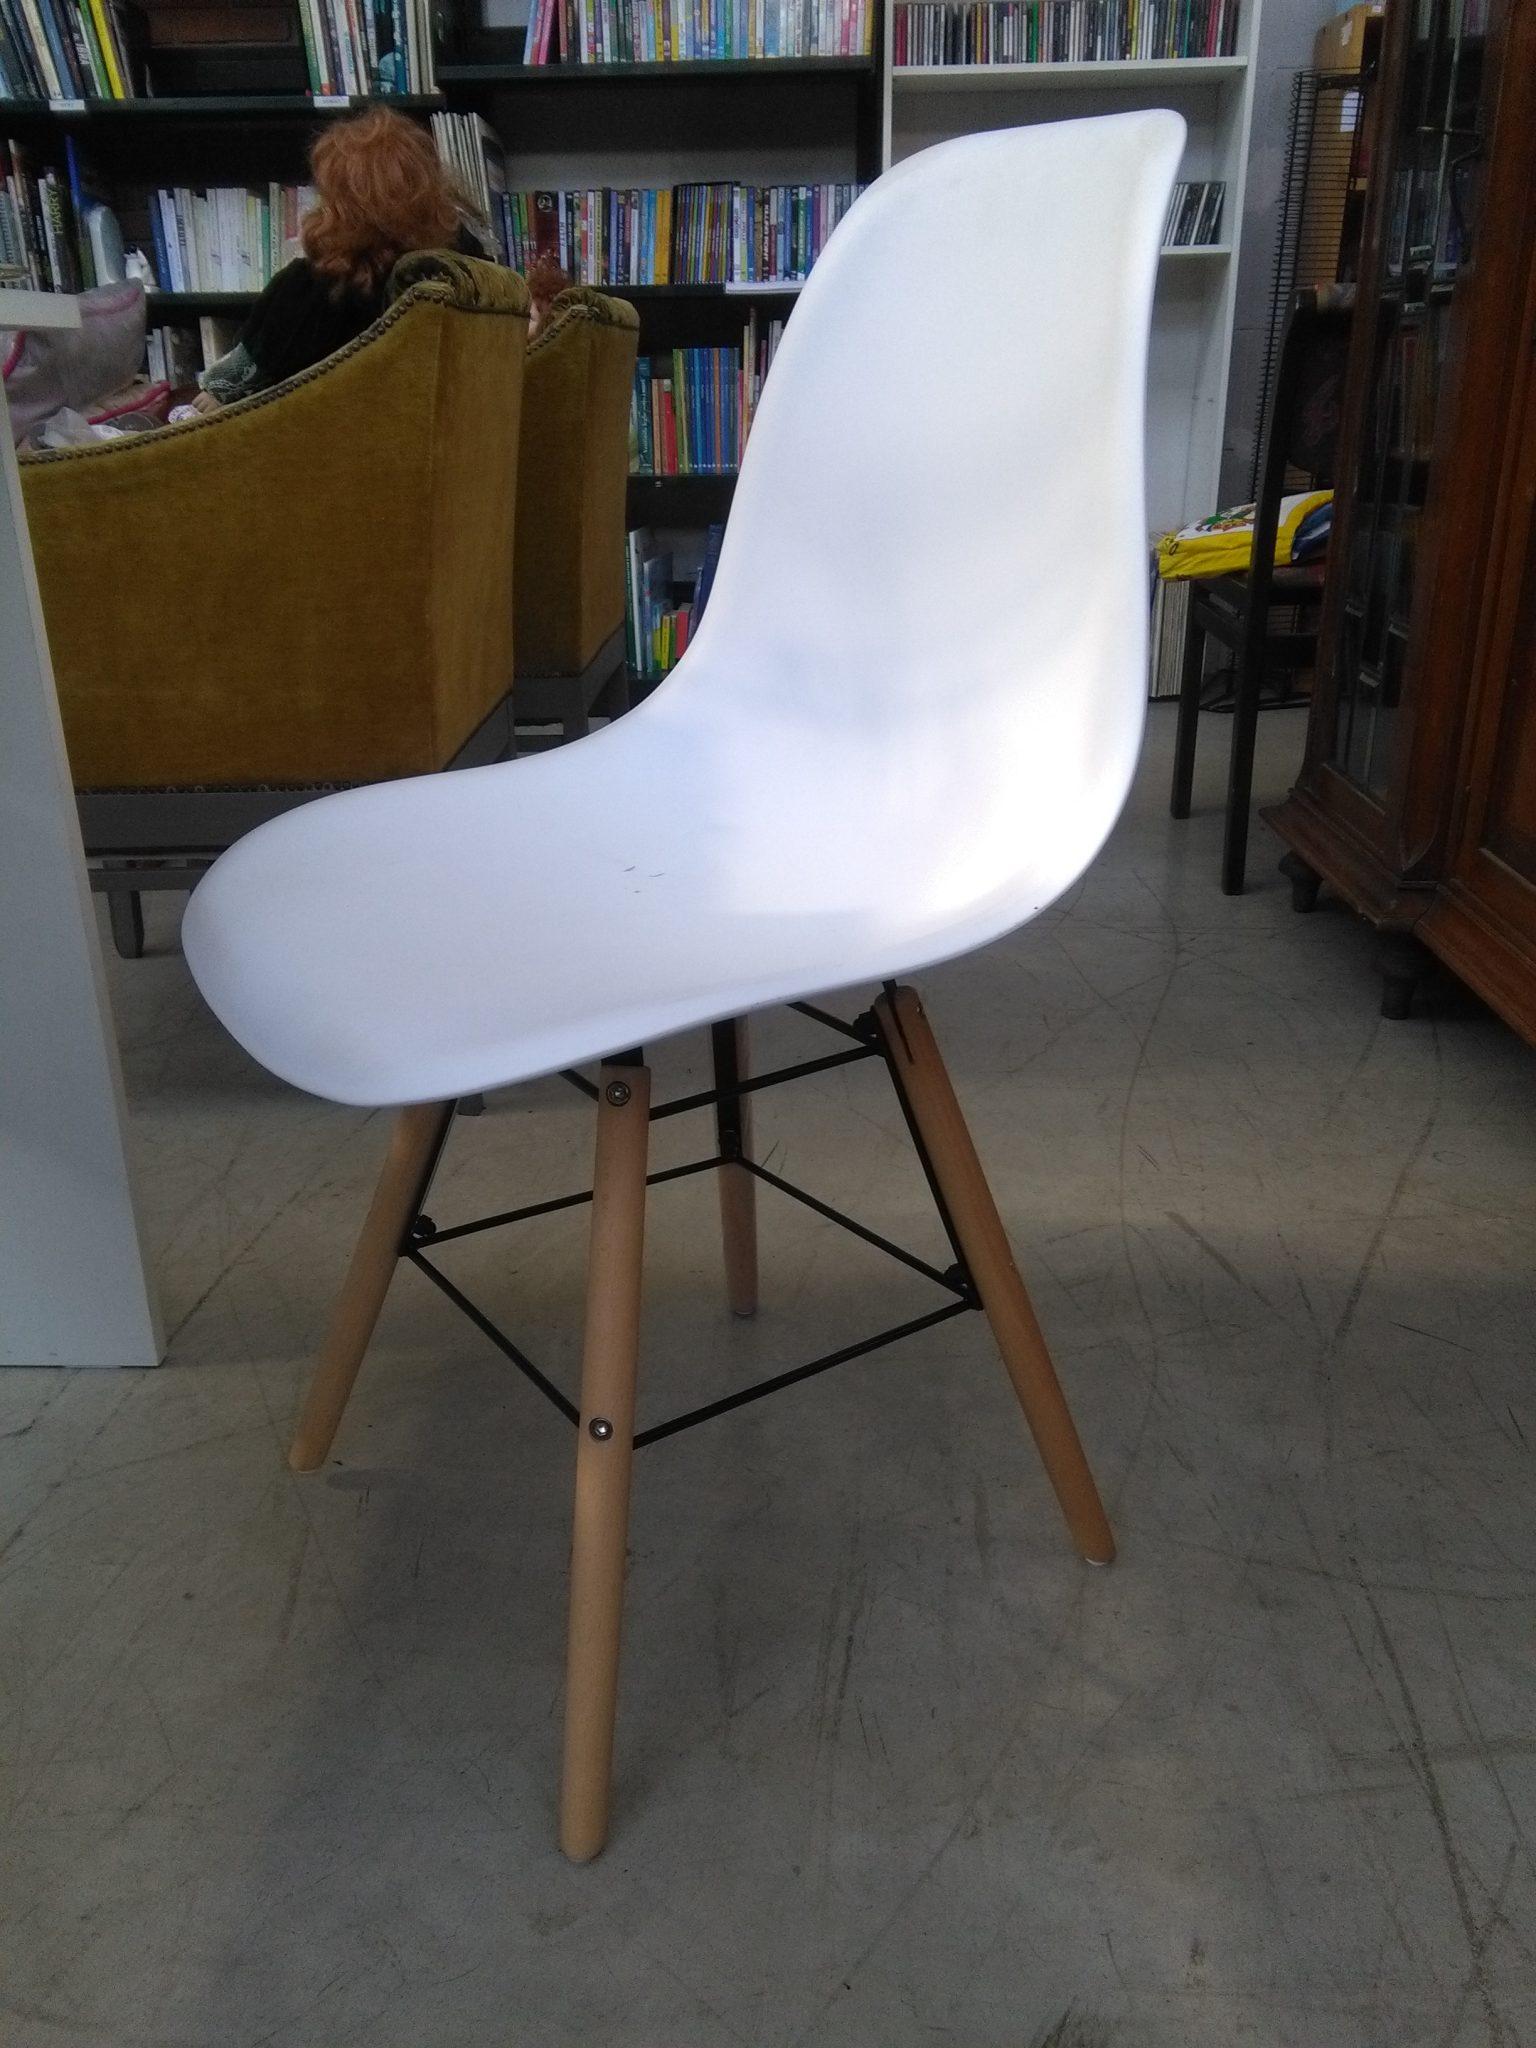 Sedia bianca design moderno si pu fare for Sedia design bianca